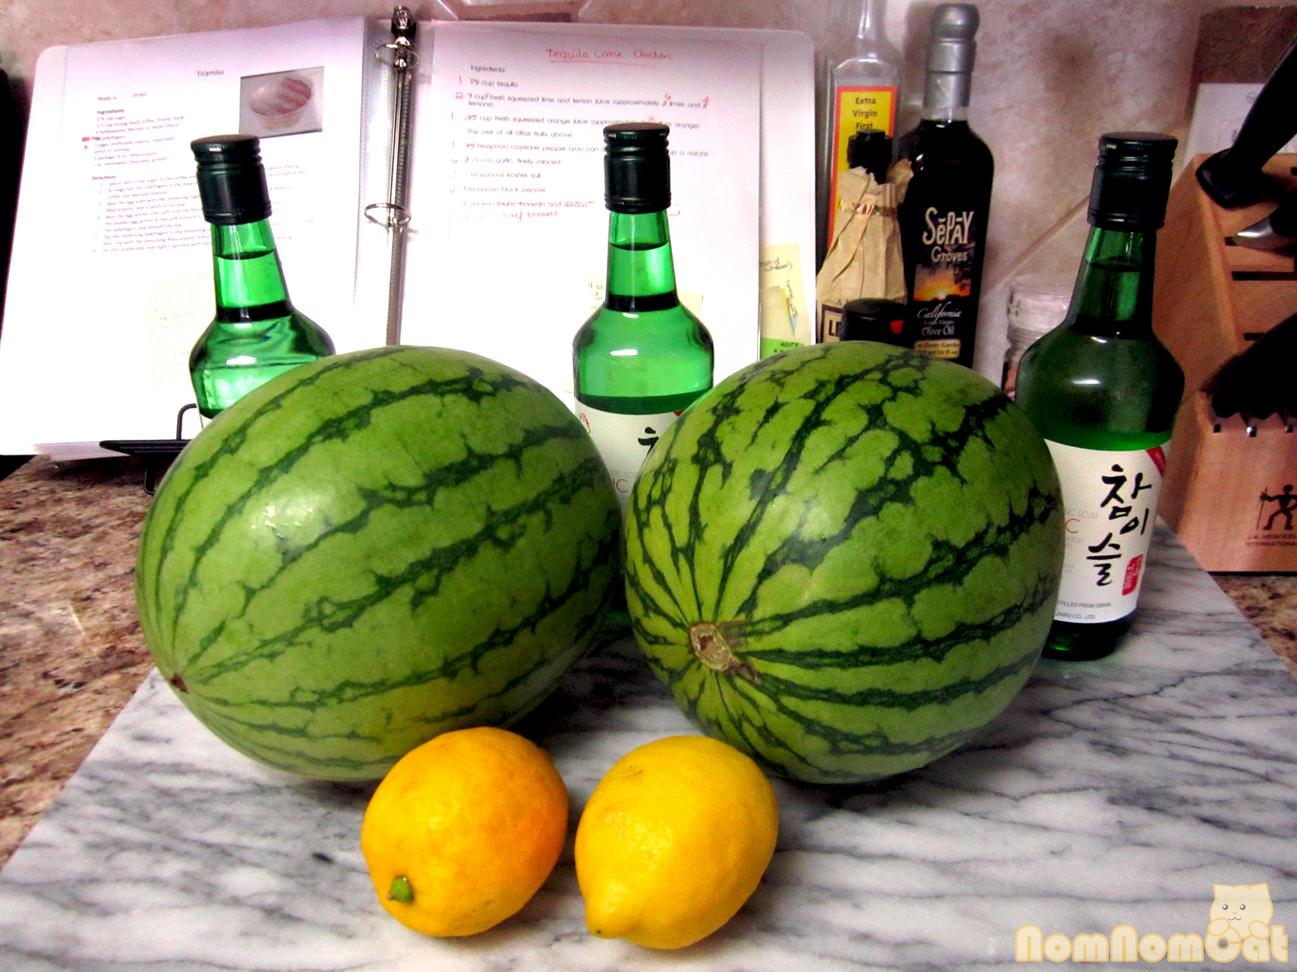 Friday Fun: Soju Watermelon | nom nom cat